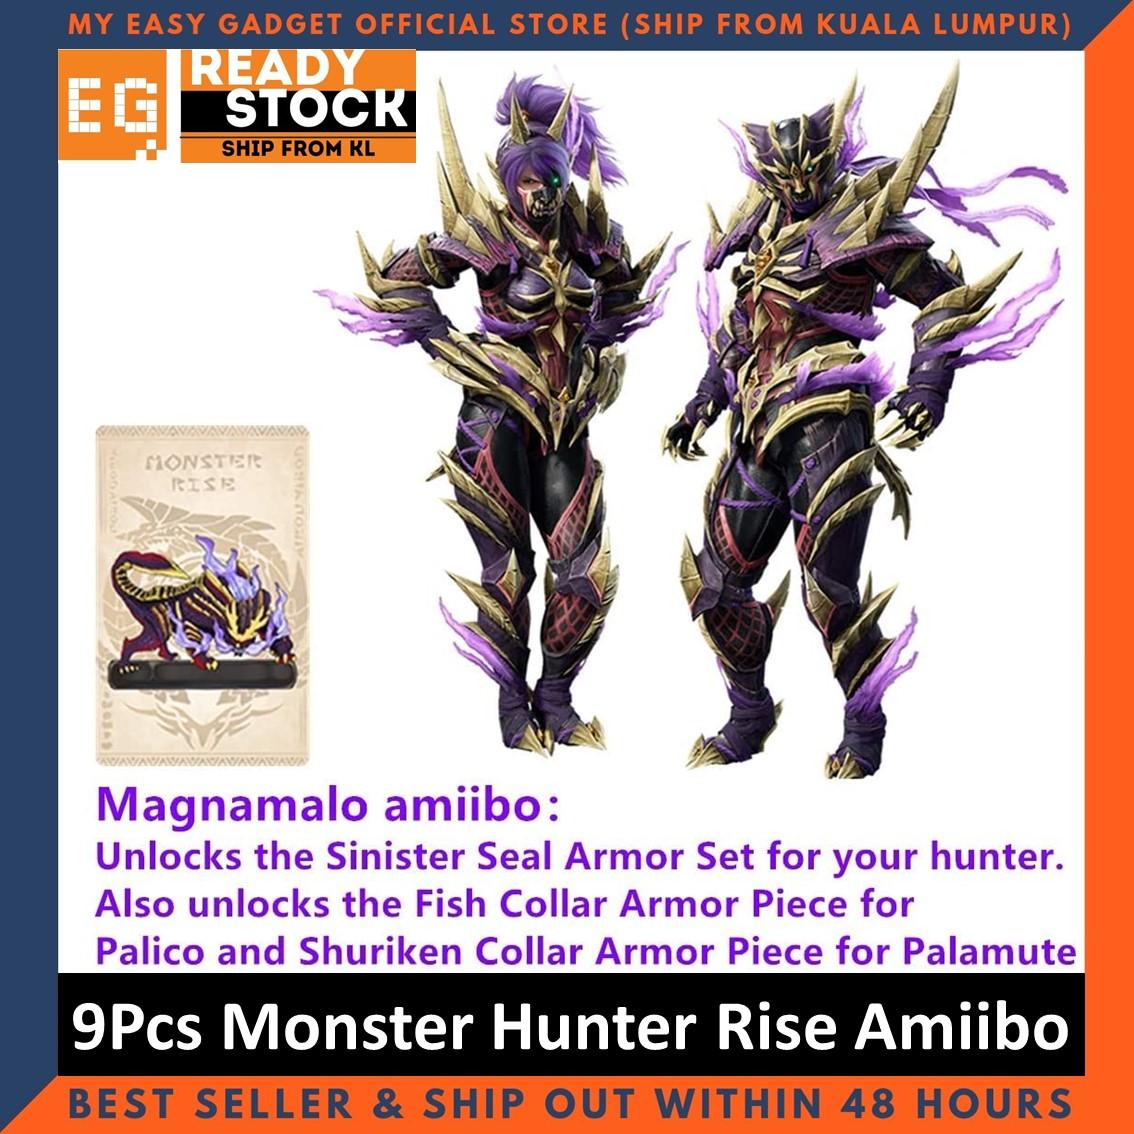 Monster Hunter Rise Amiibo NFC Tag Cards Palamute Palico Magnamalo for Nintendo Switch / Switch lite 9Pcs Mini Card Size